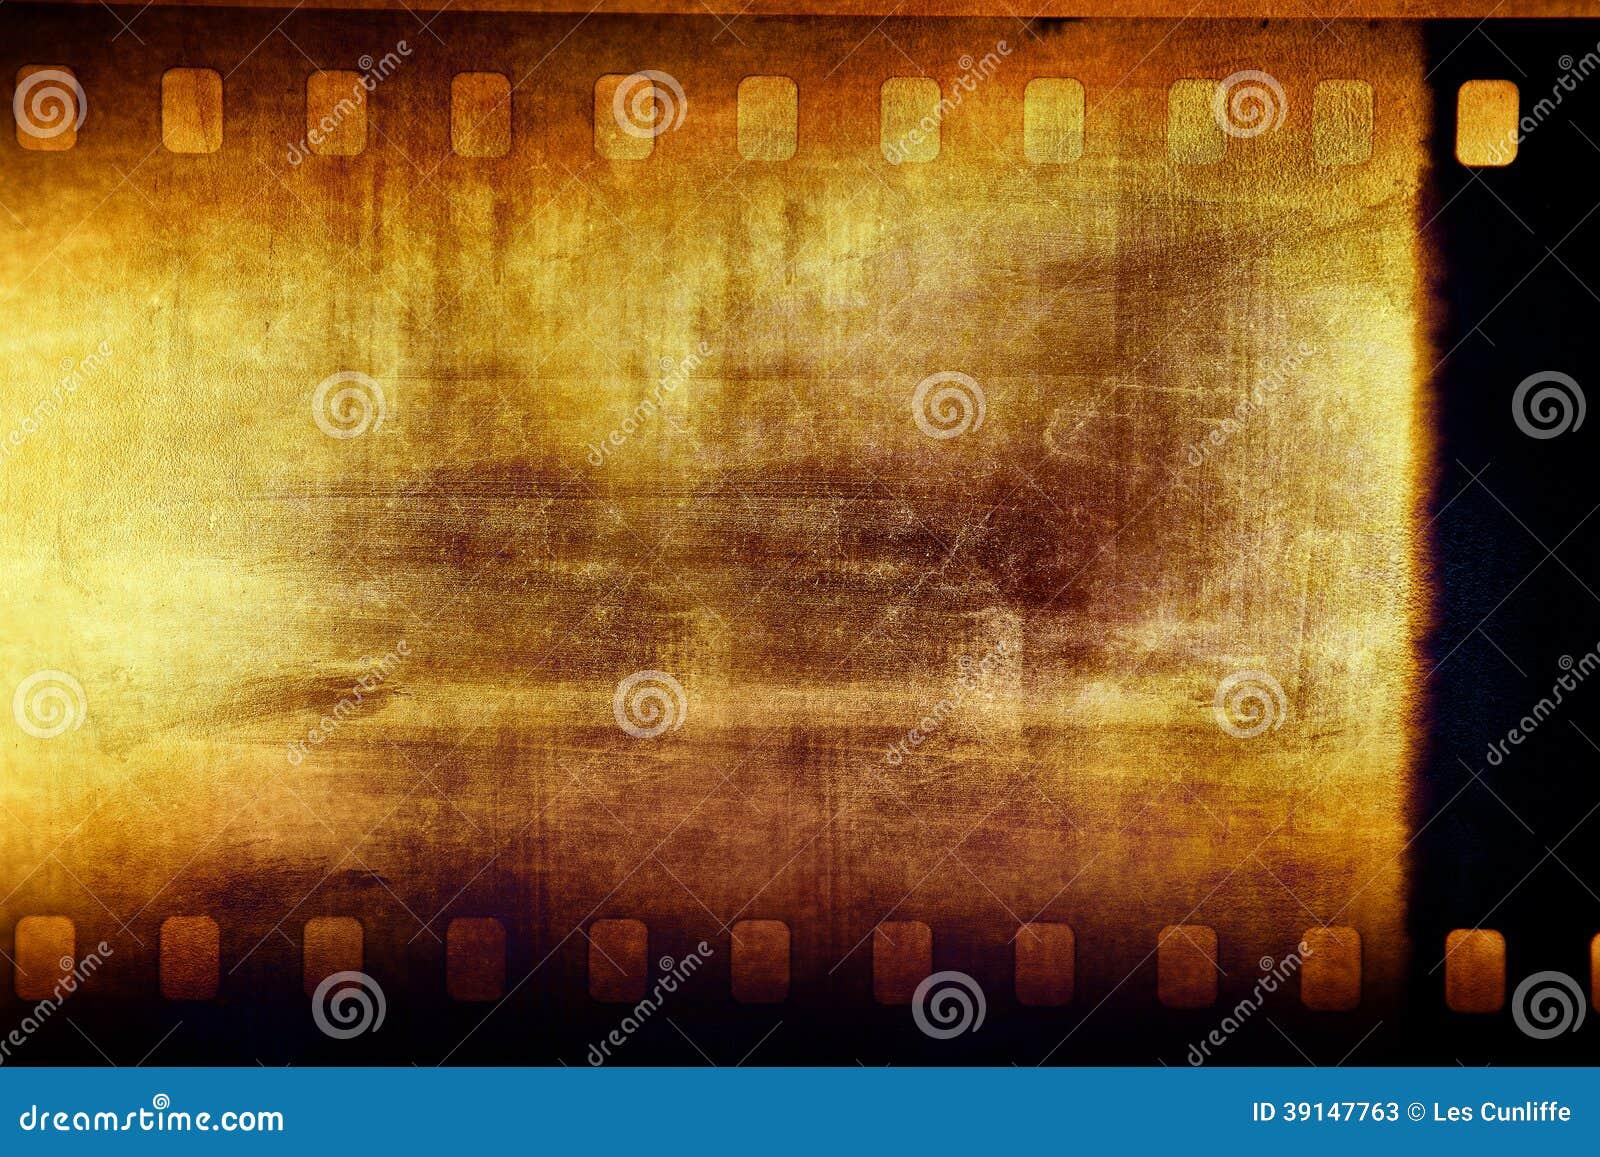 Filmstrip Stock Photo - Image: 39147763